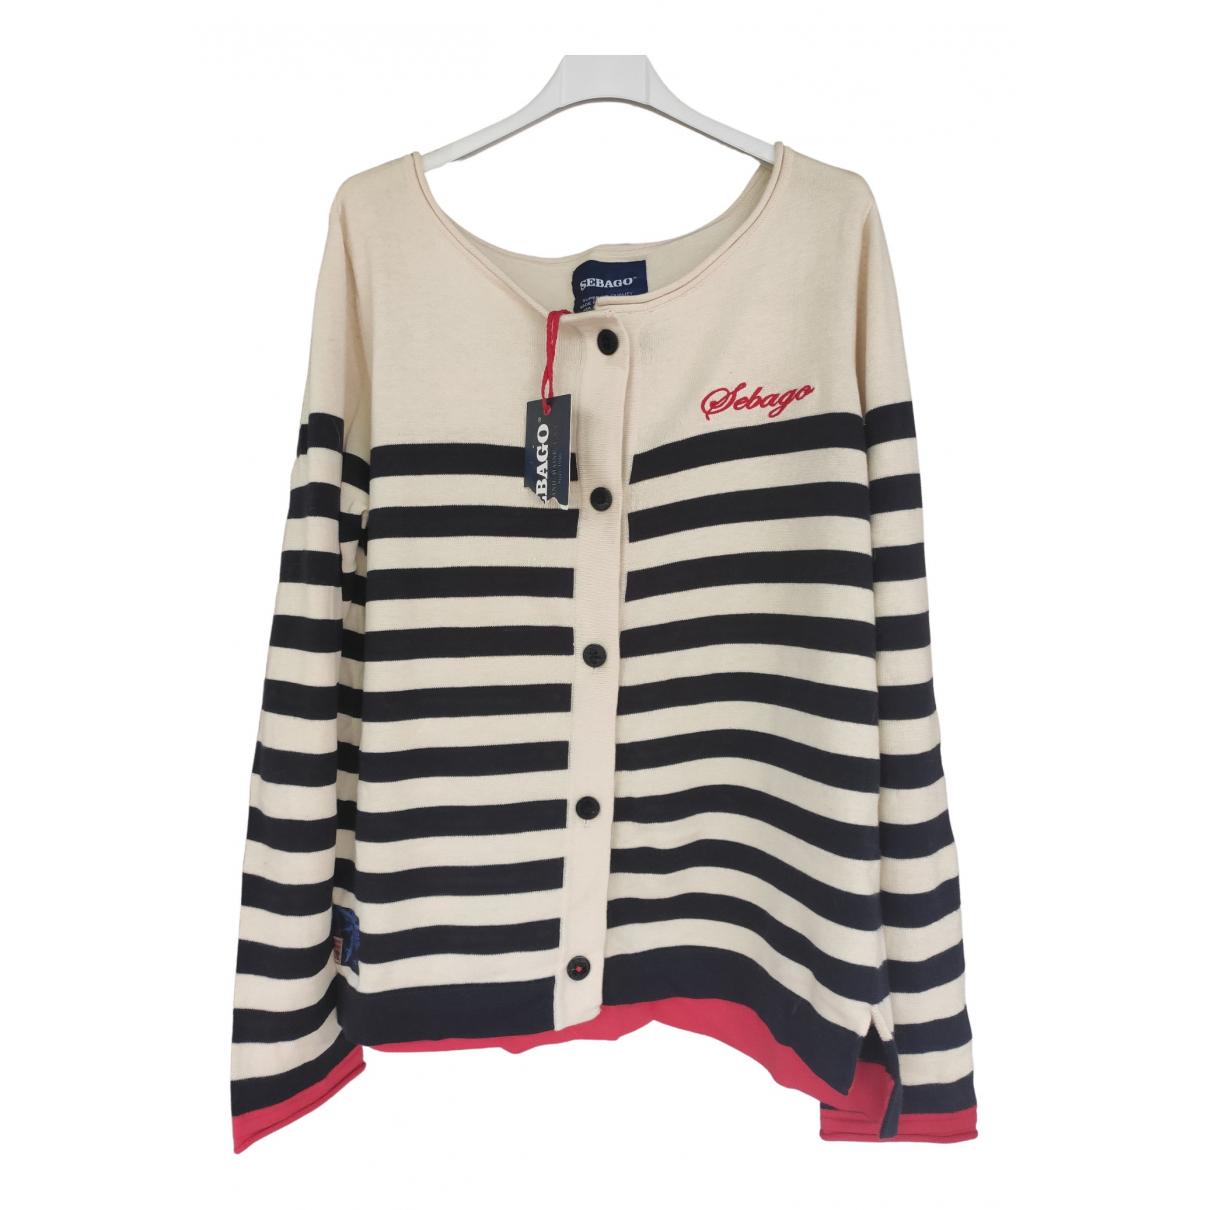 Sebago \N Ecru Cotton Knitwear for Women XL International